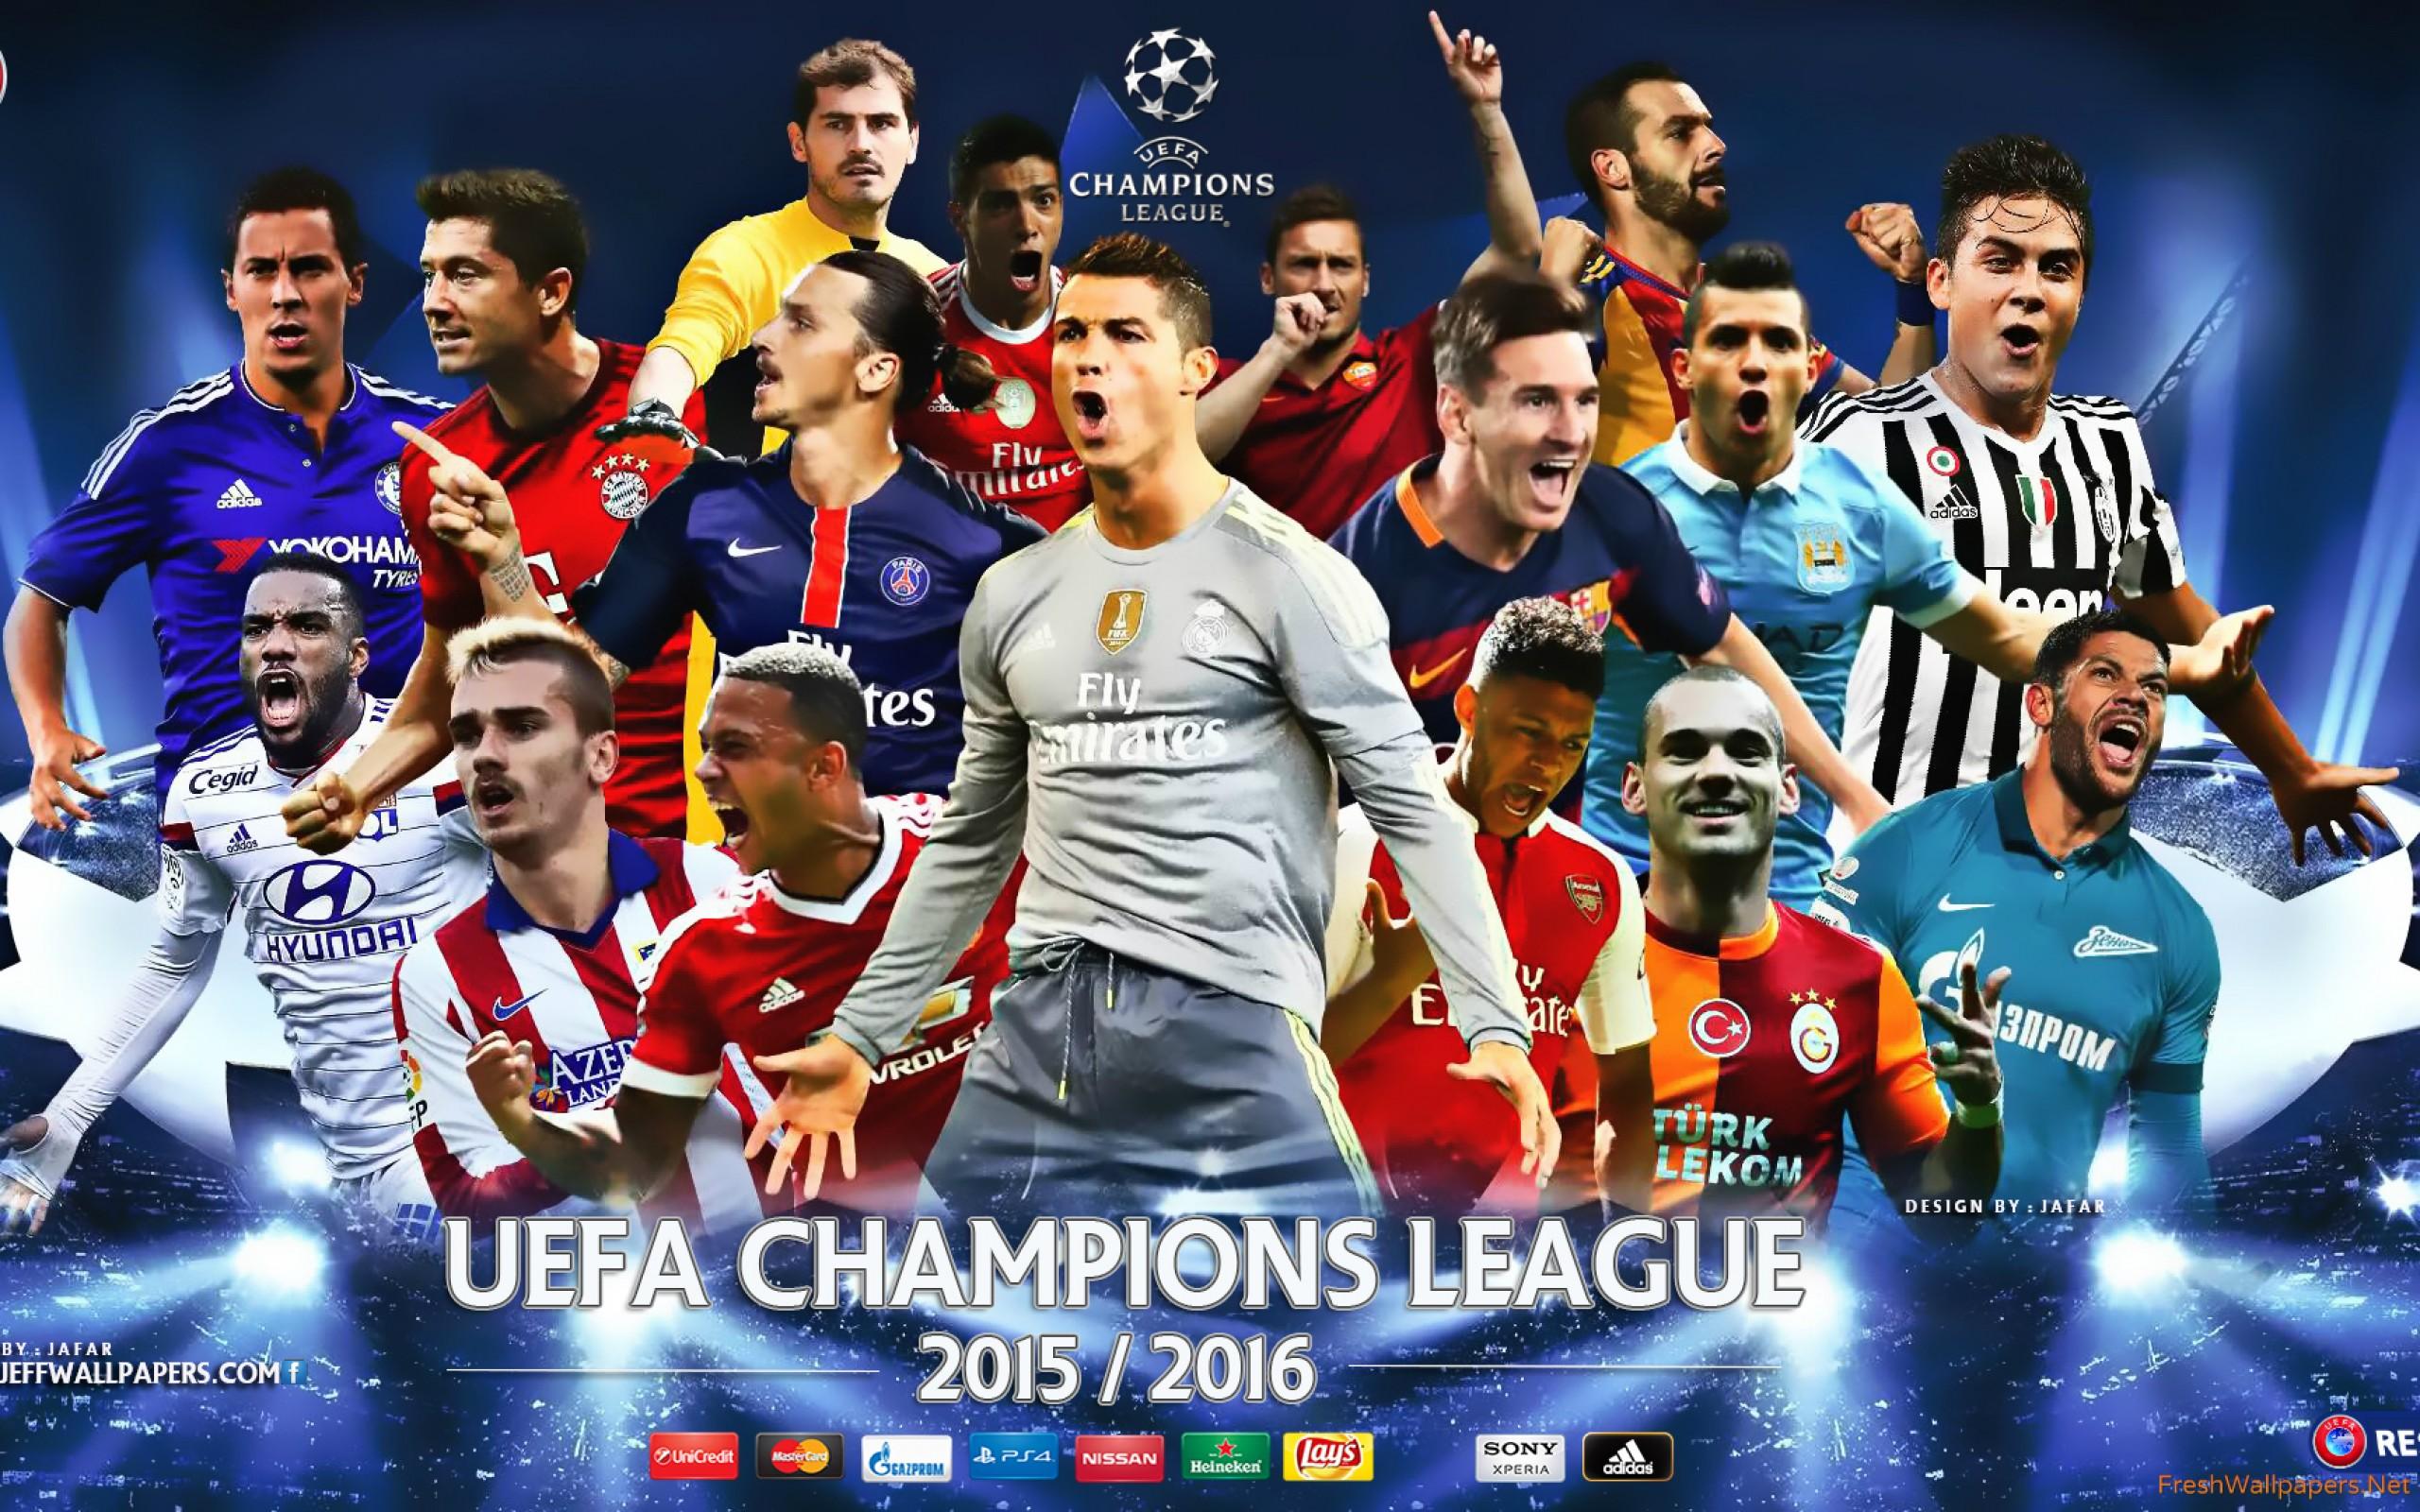 UEFA Champinos League